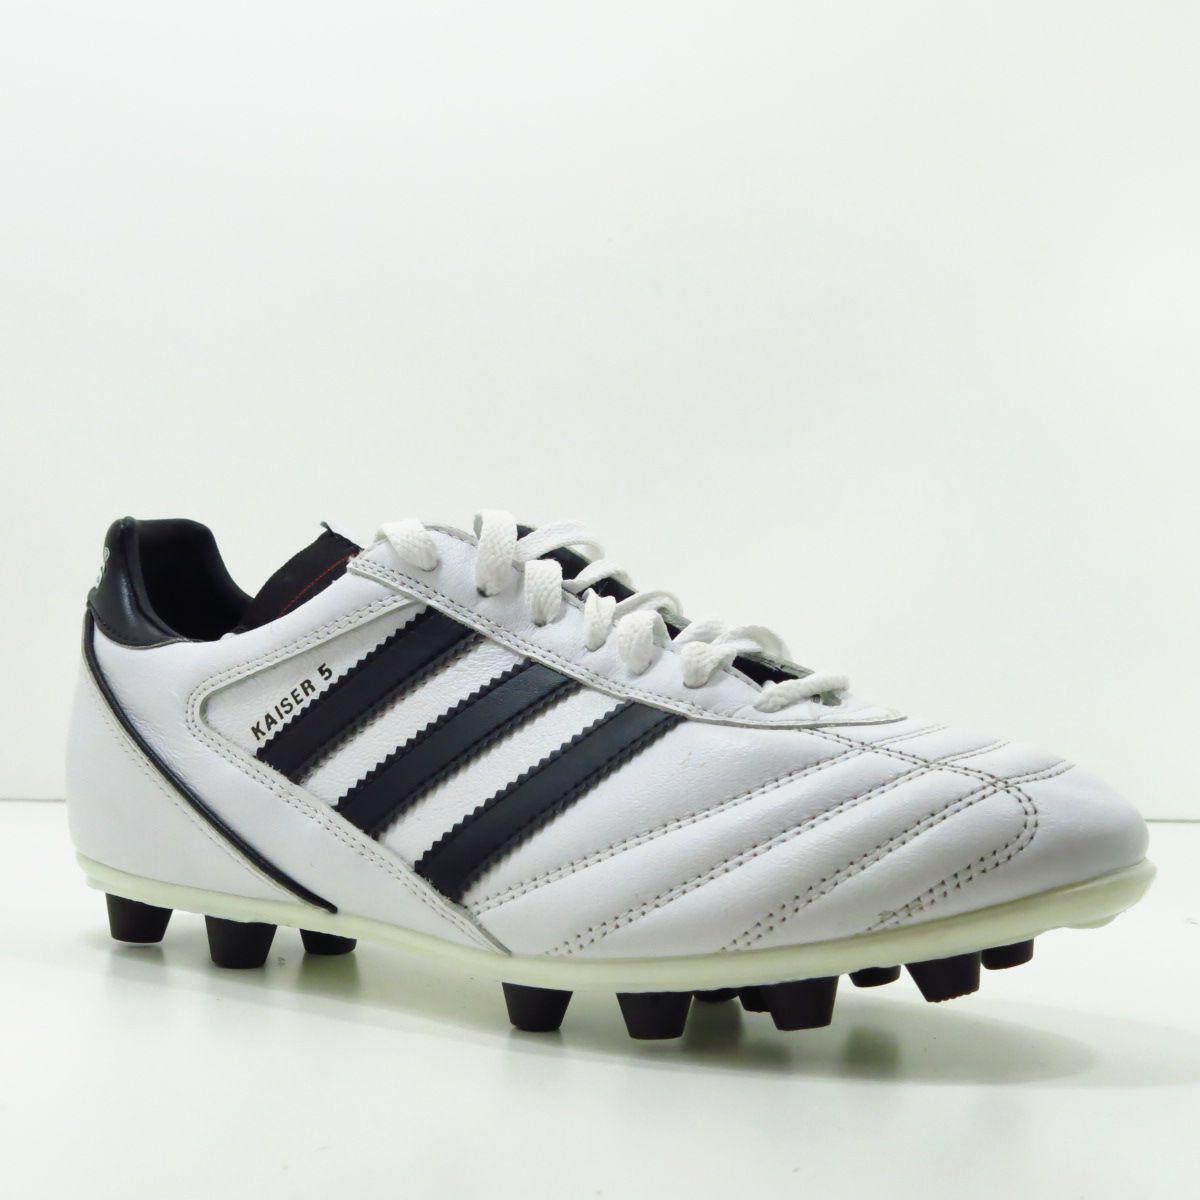 Chuteira Adidas Kaiser FG - Couro